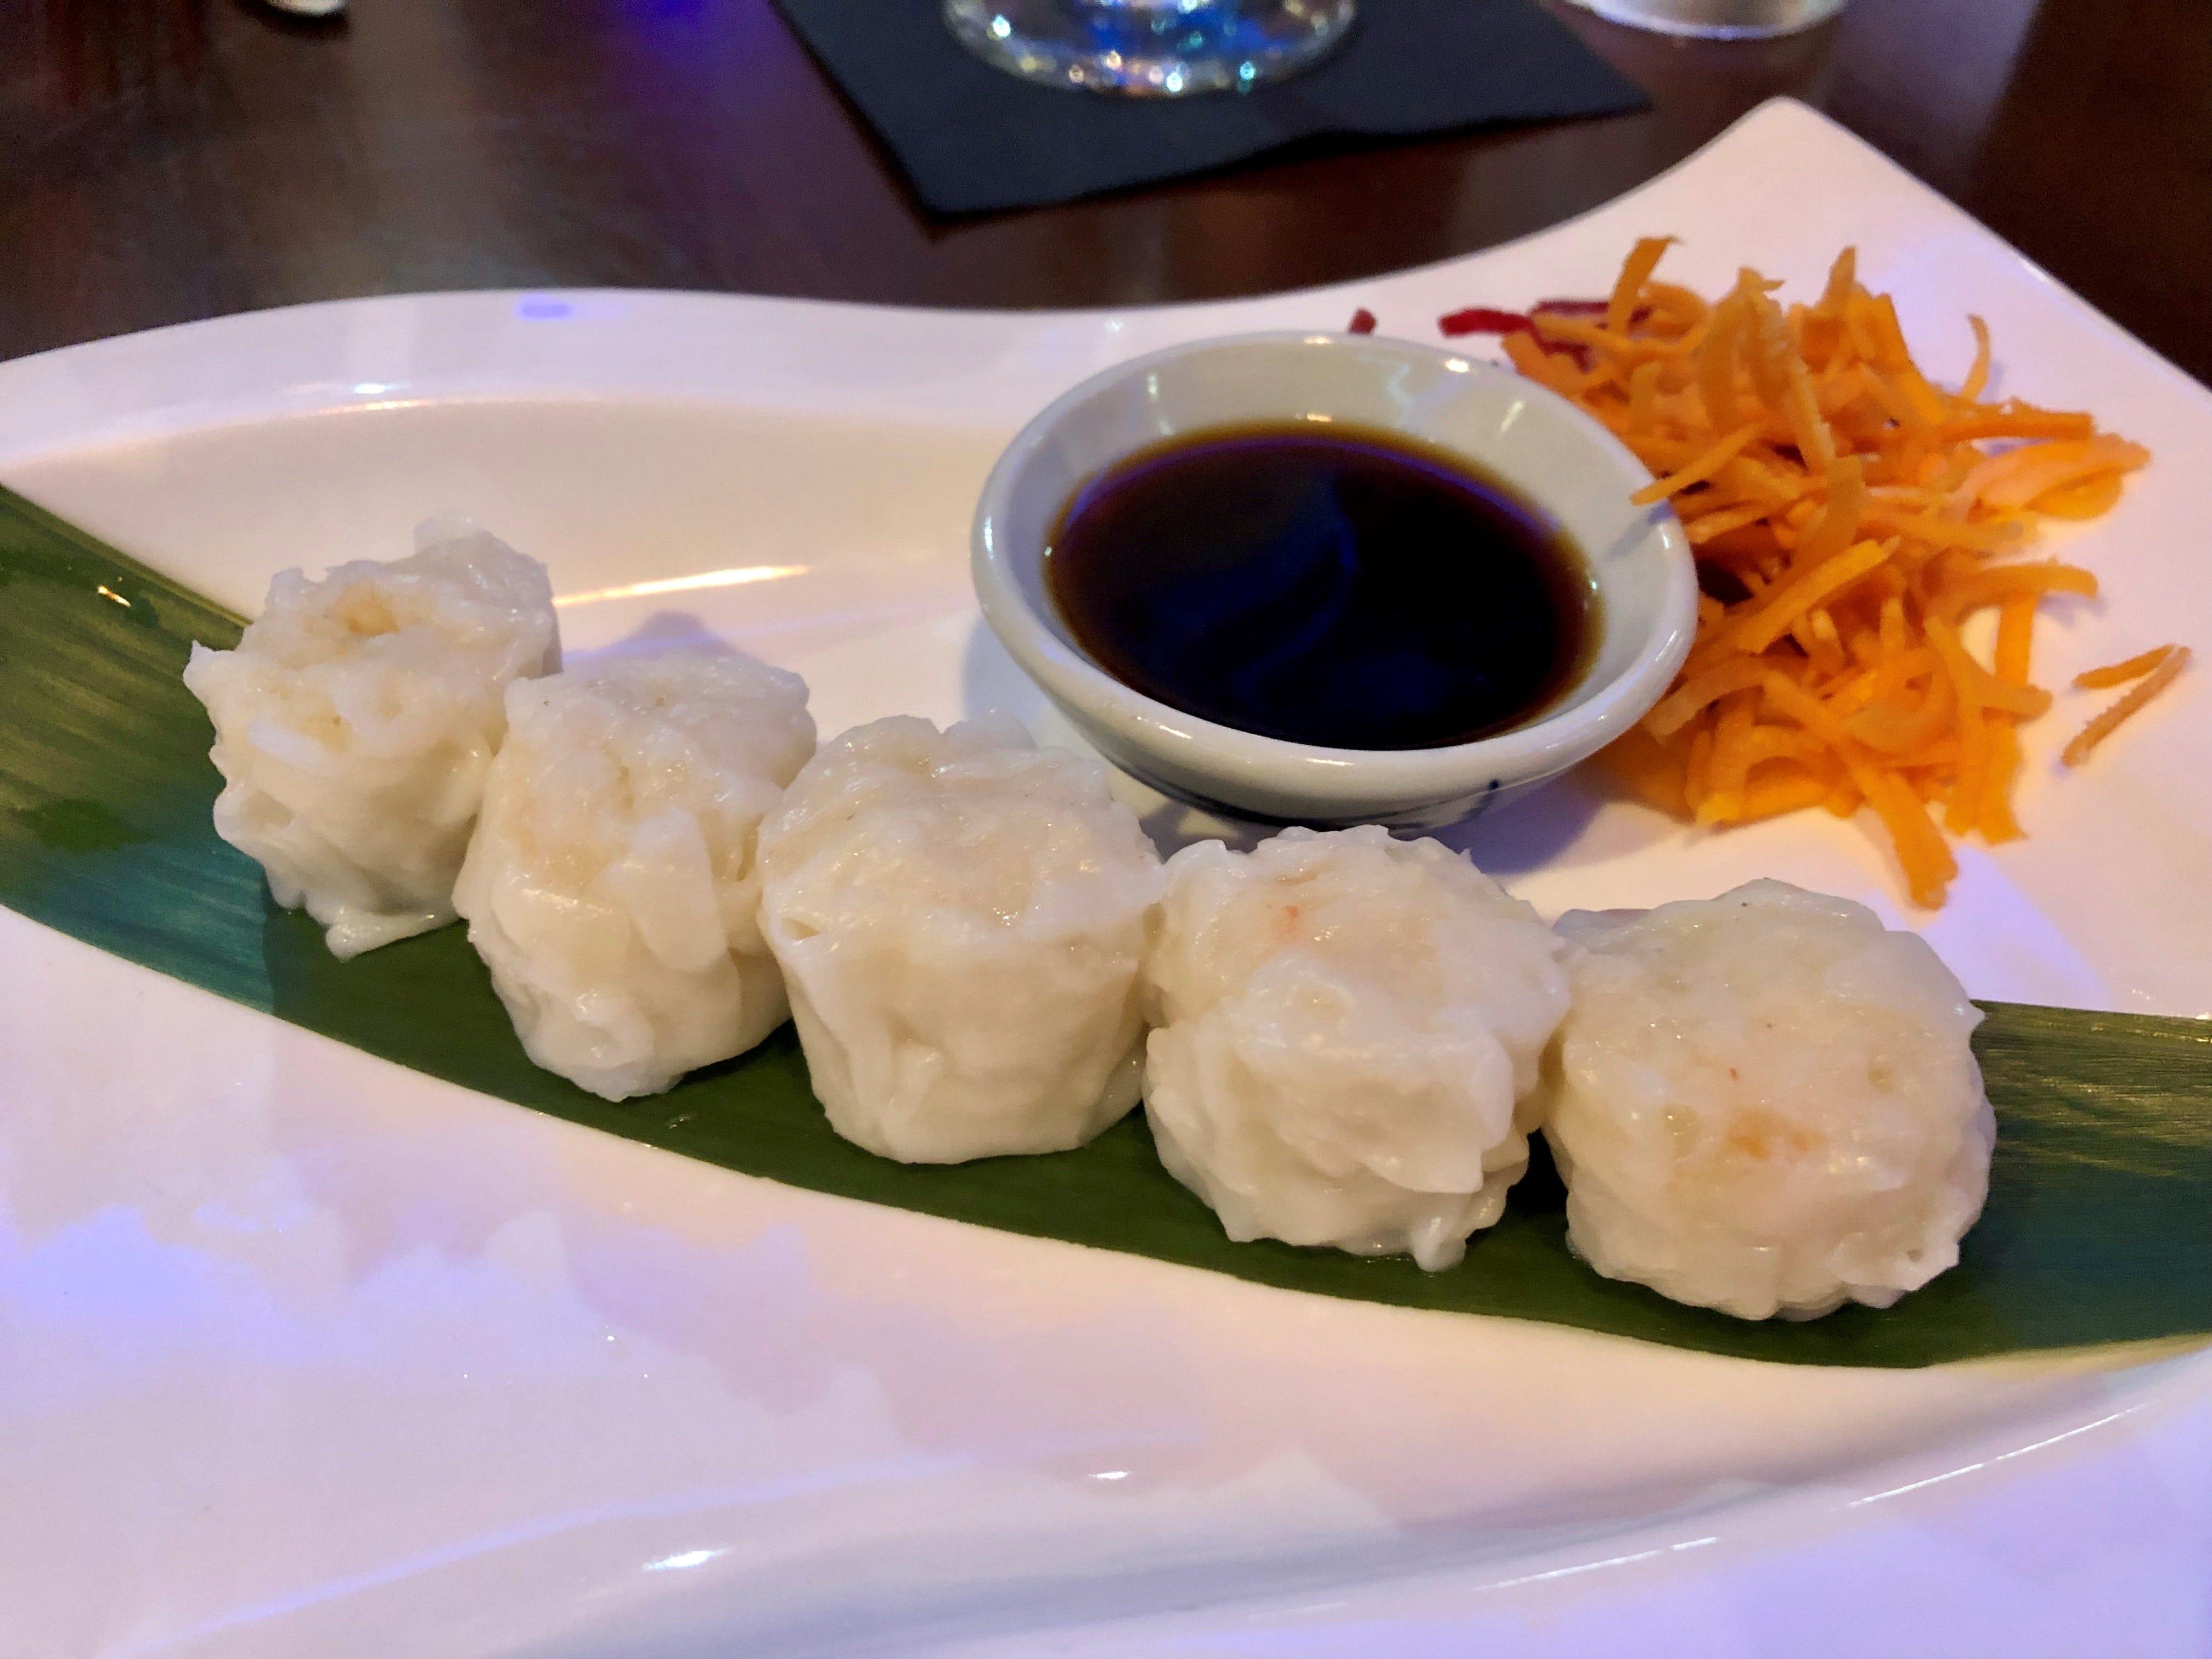 Steamed dumplings from Ninja Thai & Sushi Bar in south Fort Myers.